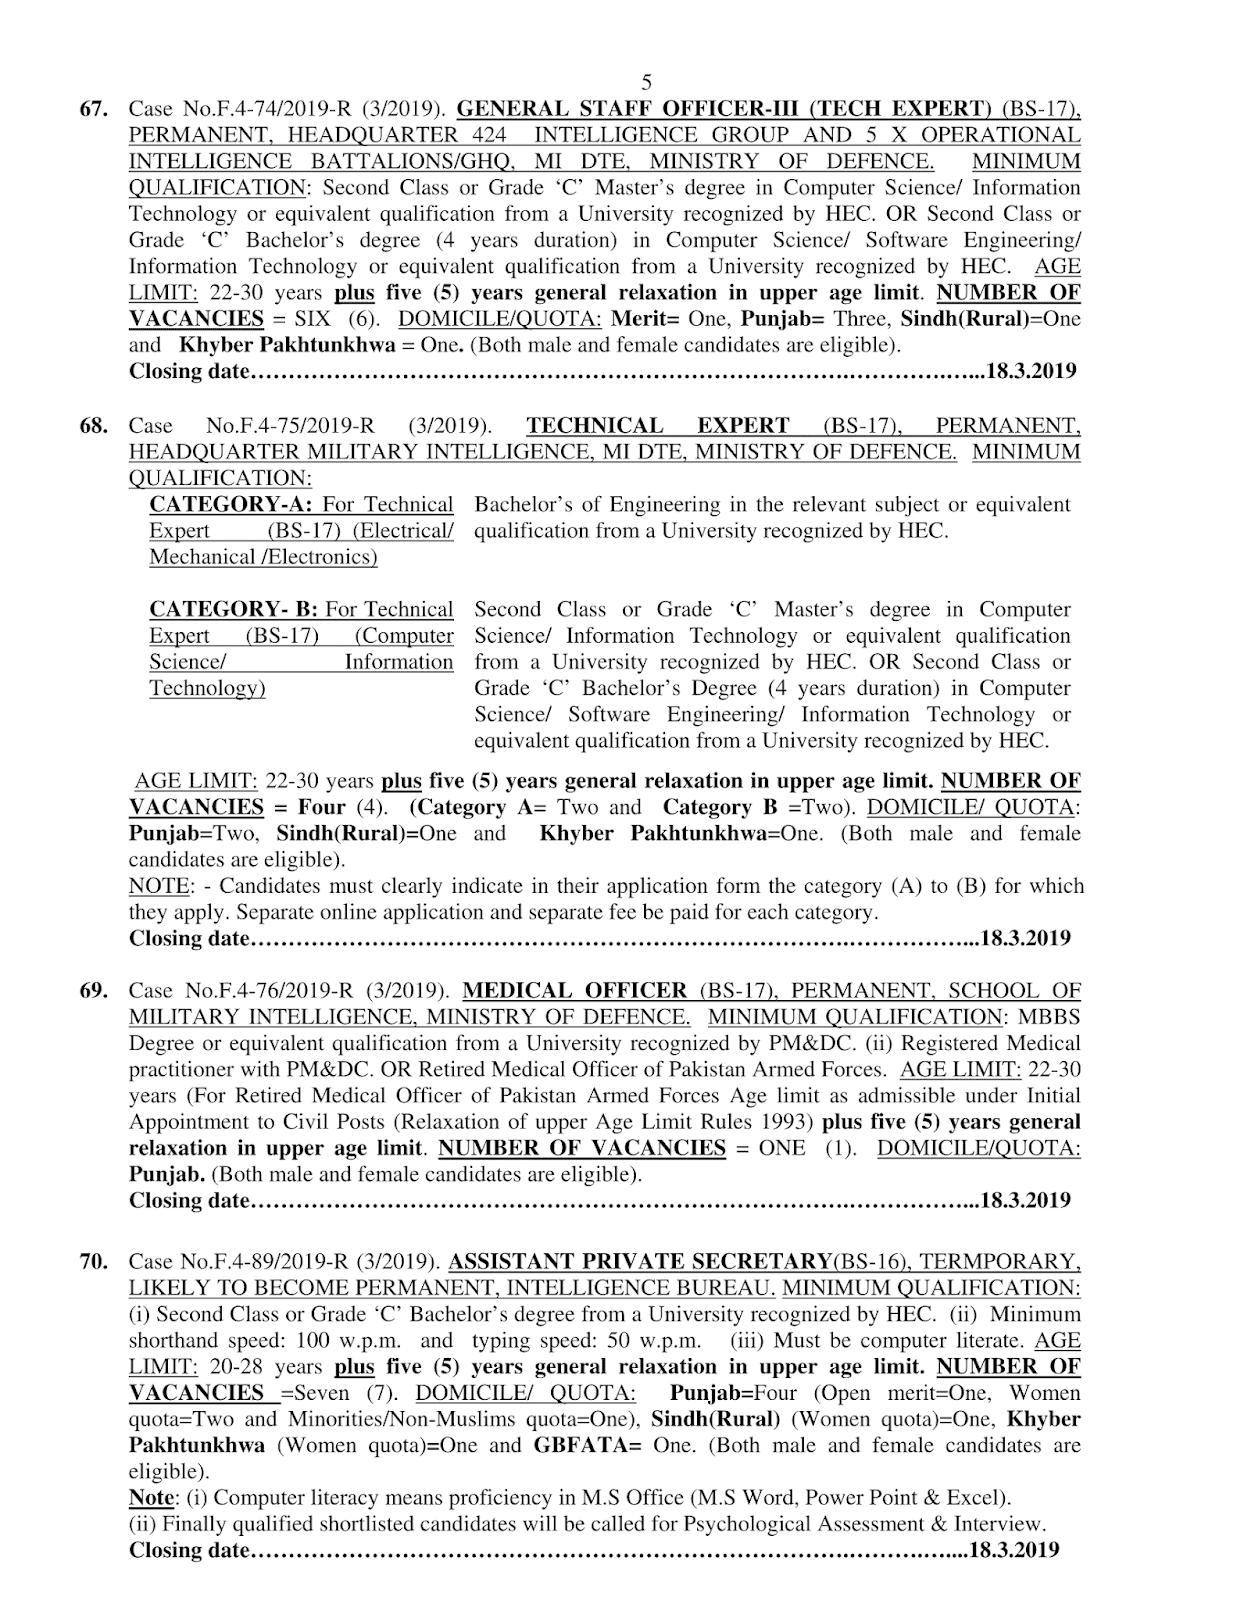 FPSC Advertisement 03/2019 Page No. 5/7